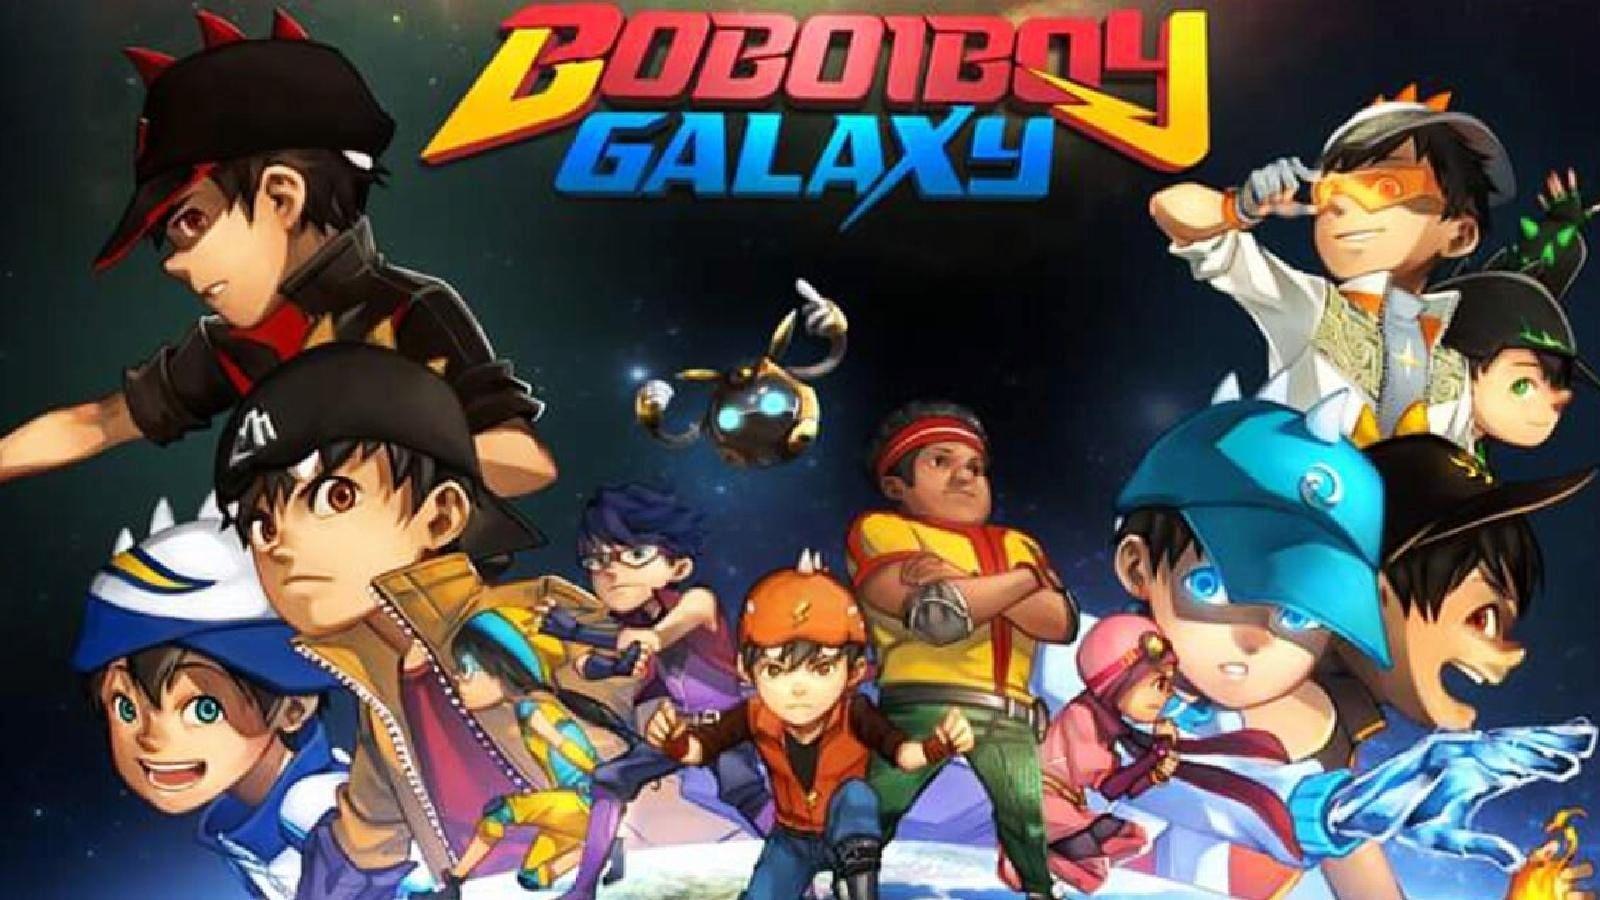 78 Gambar Boboiboy Galaxy Es Terbaik